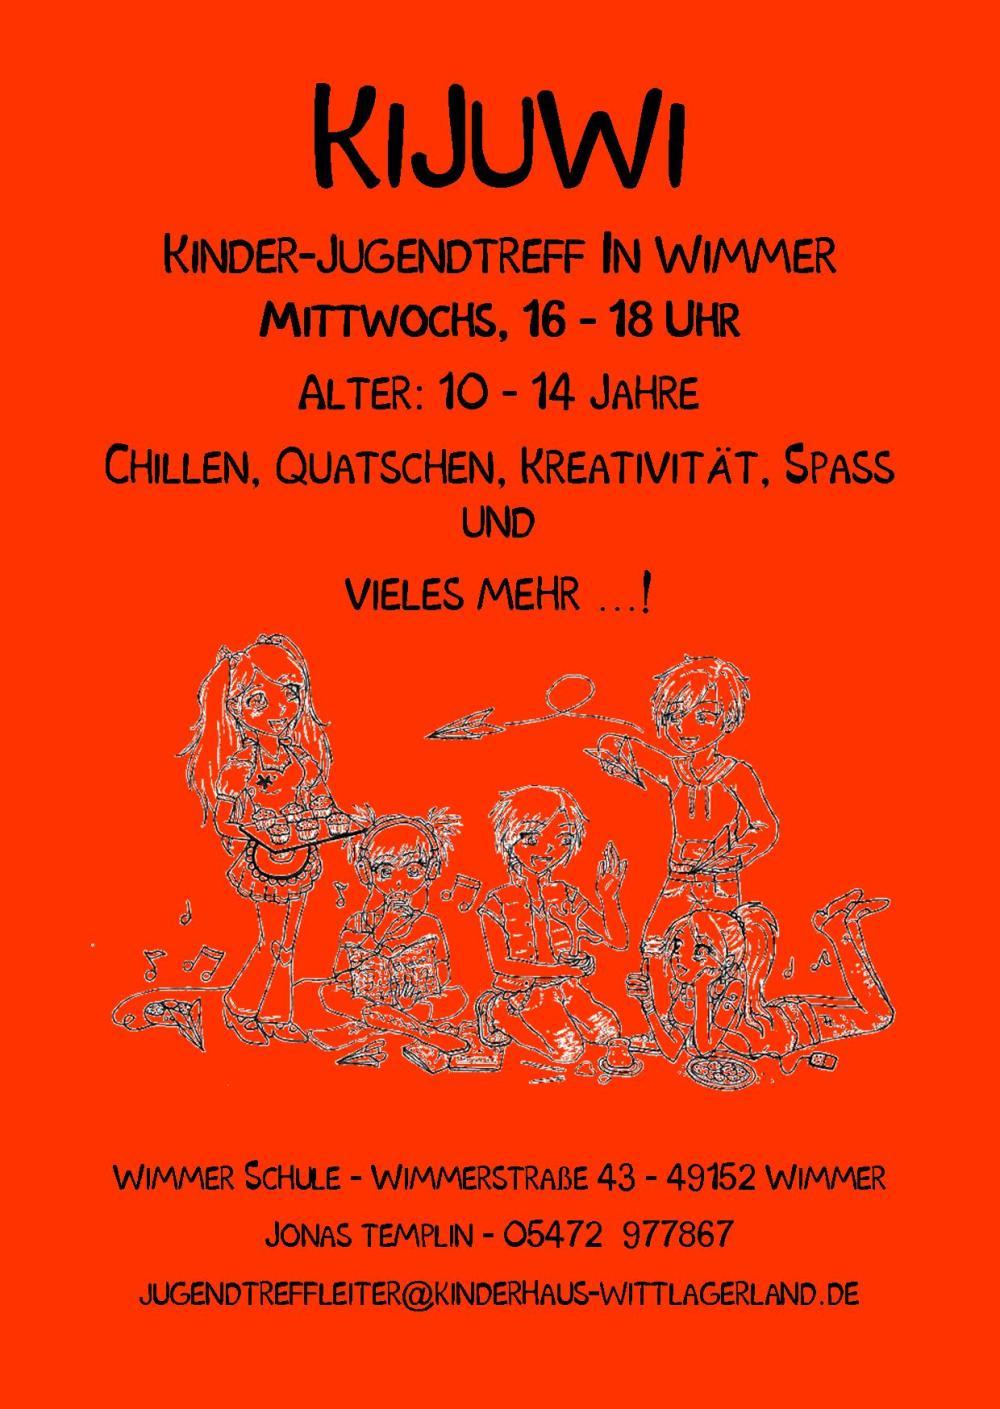 KiJuWi front Publisher 11.2015 rot